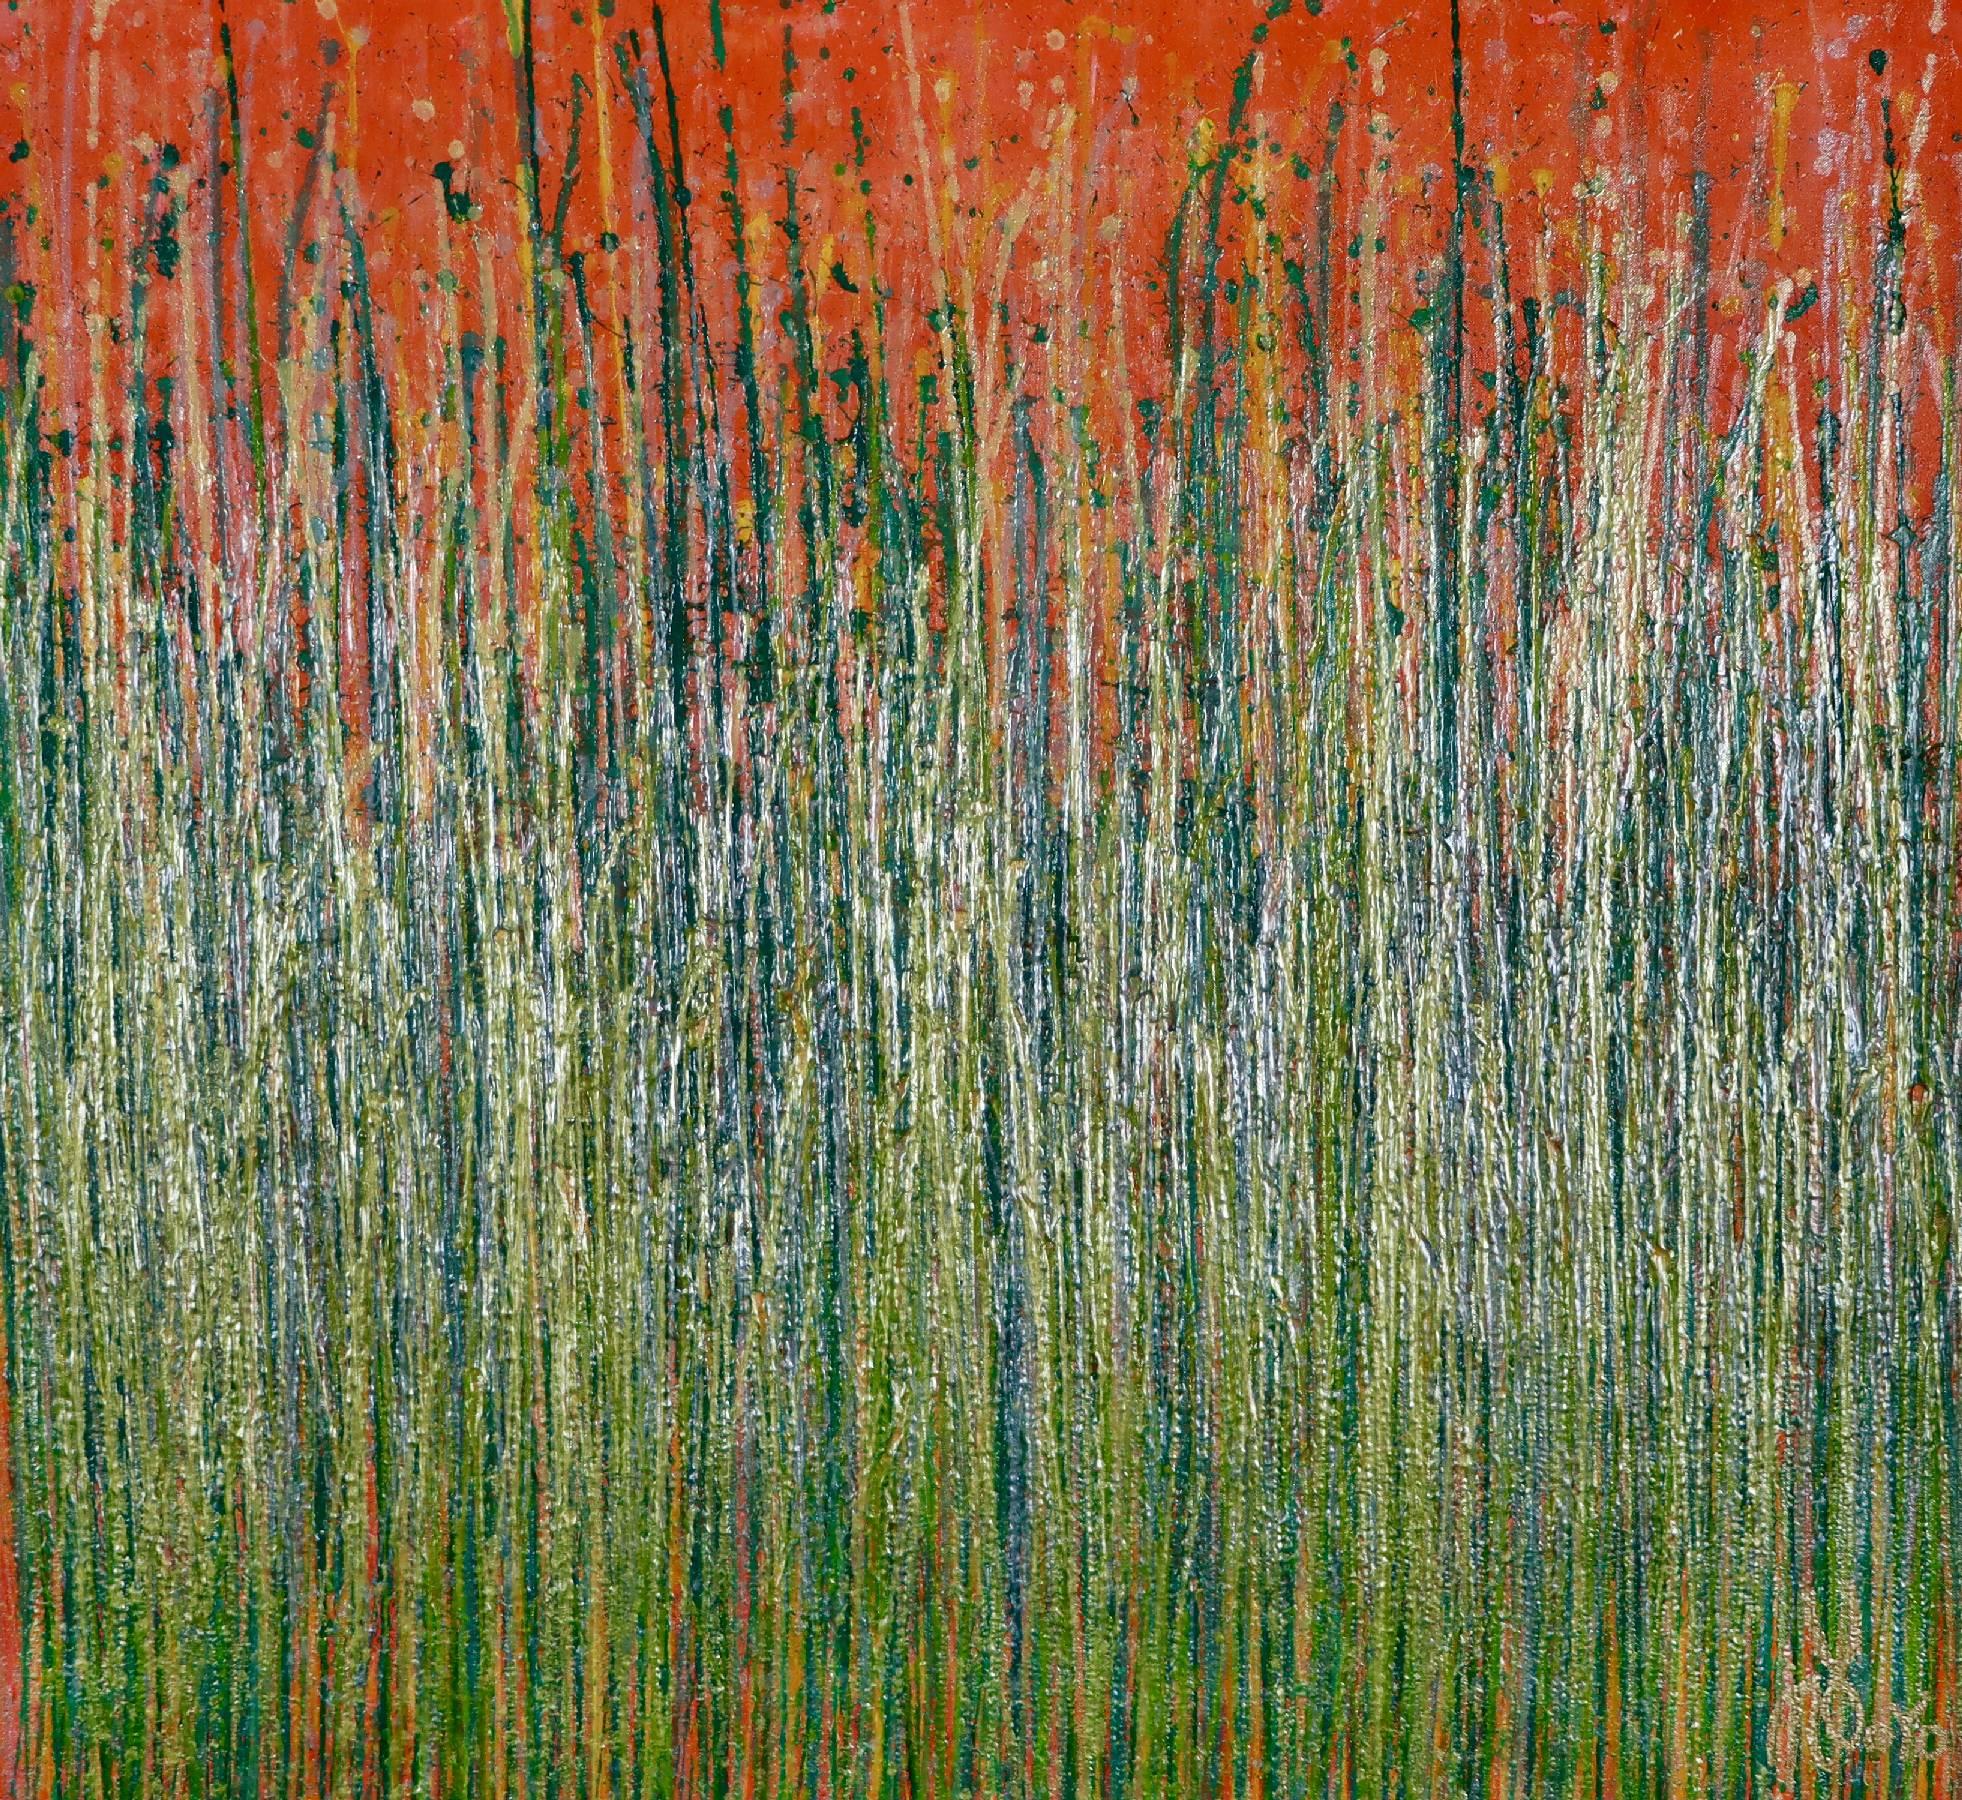 Full Canvas - Daydream panorama (Natures imagery) 18 (2020) by Nestor Toro